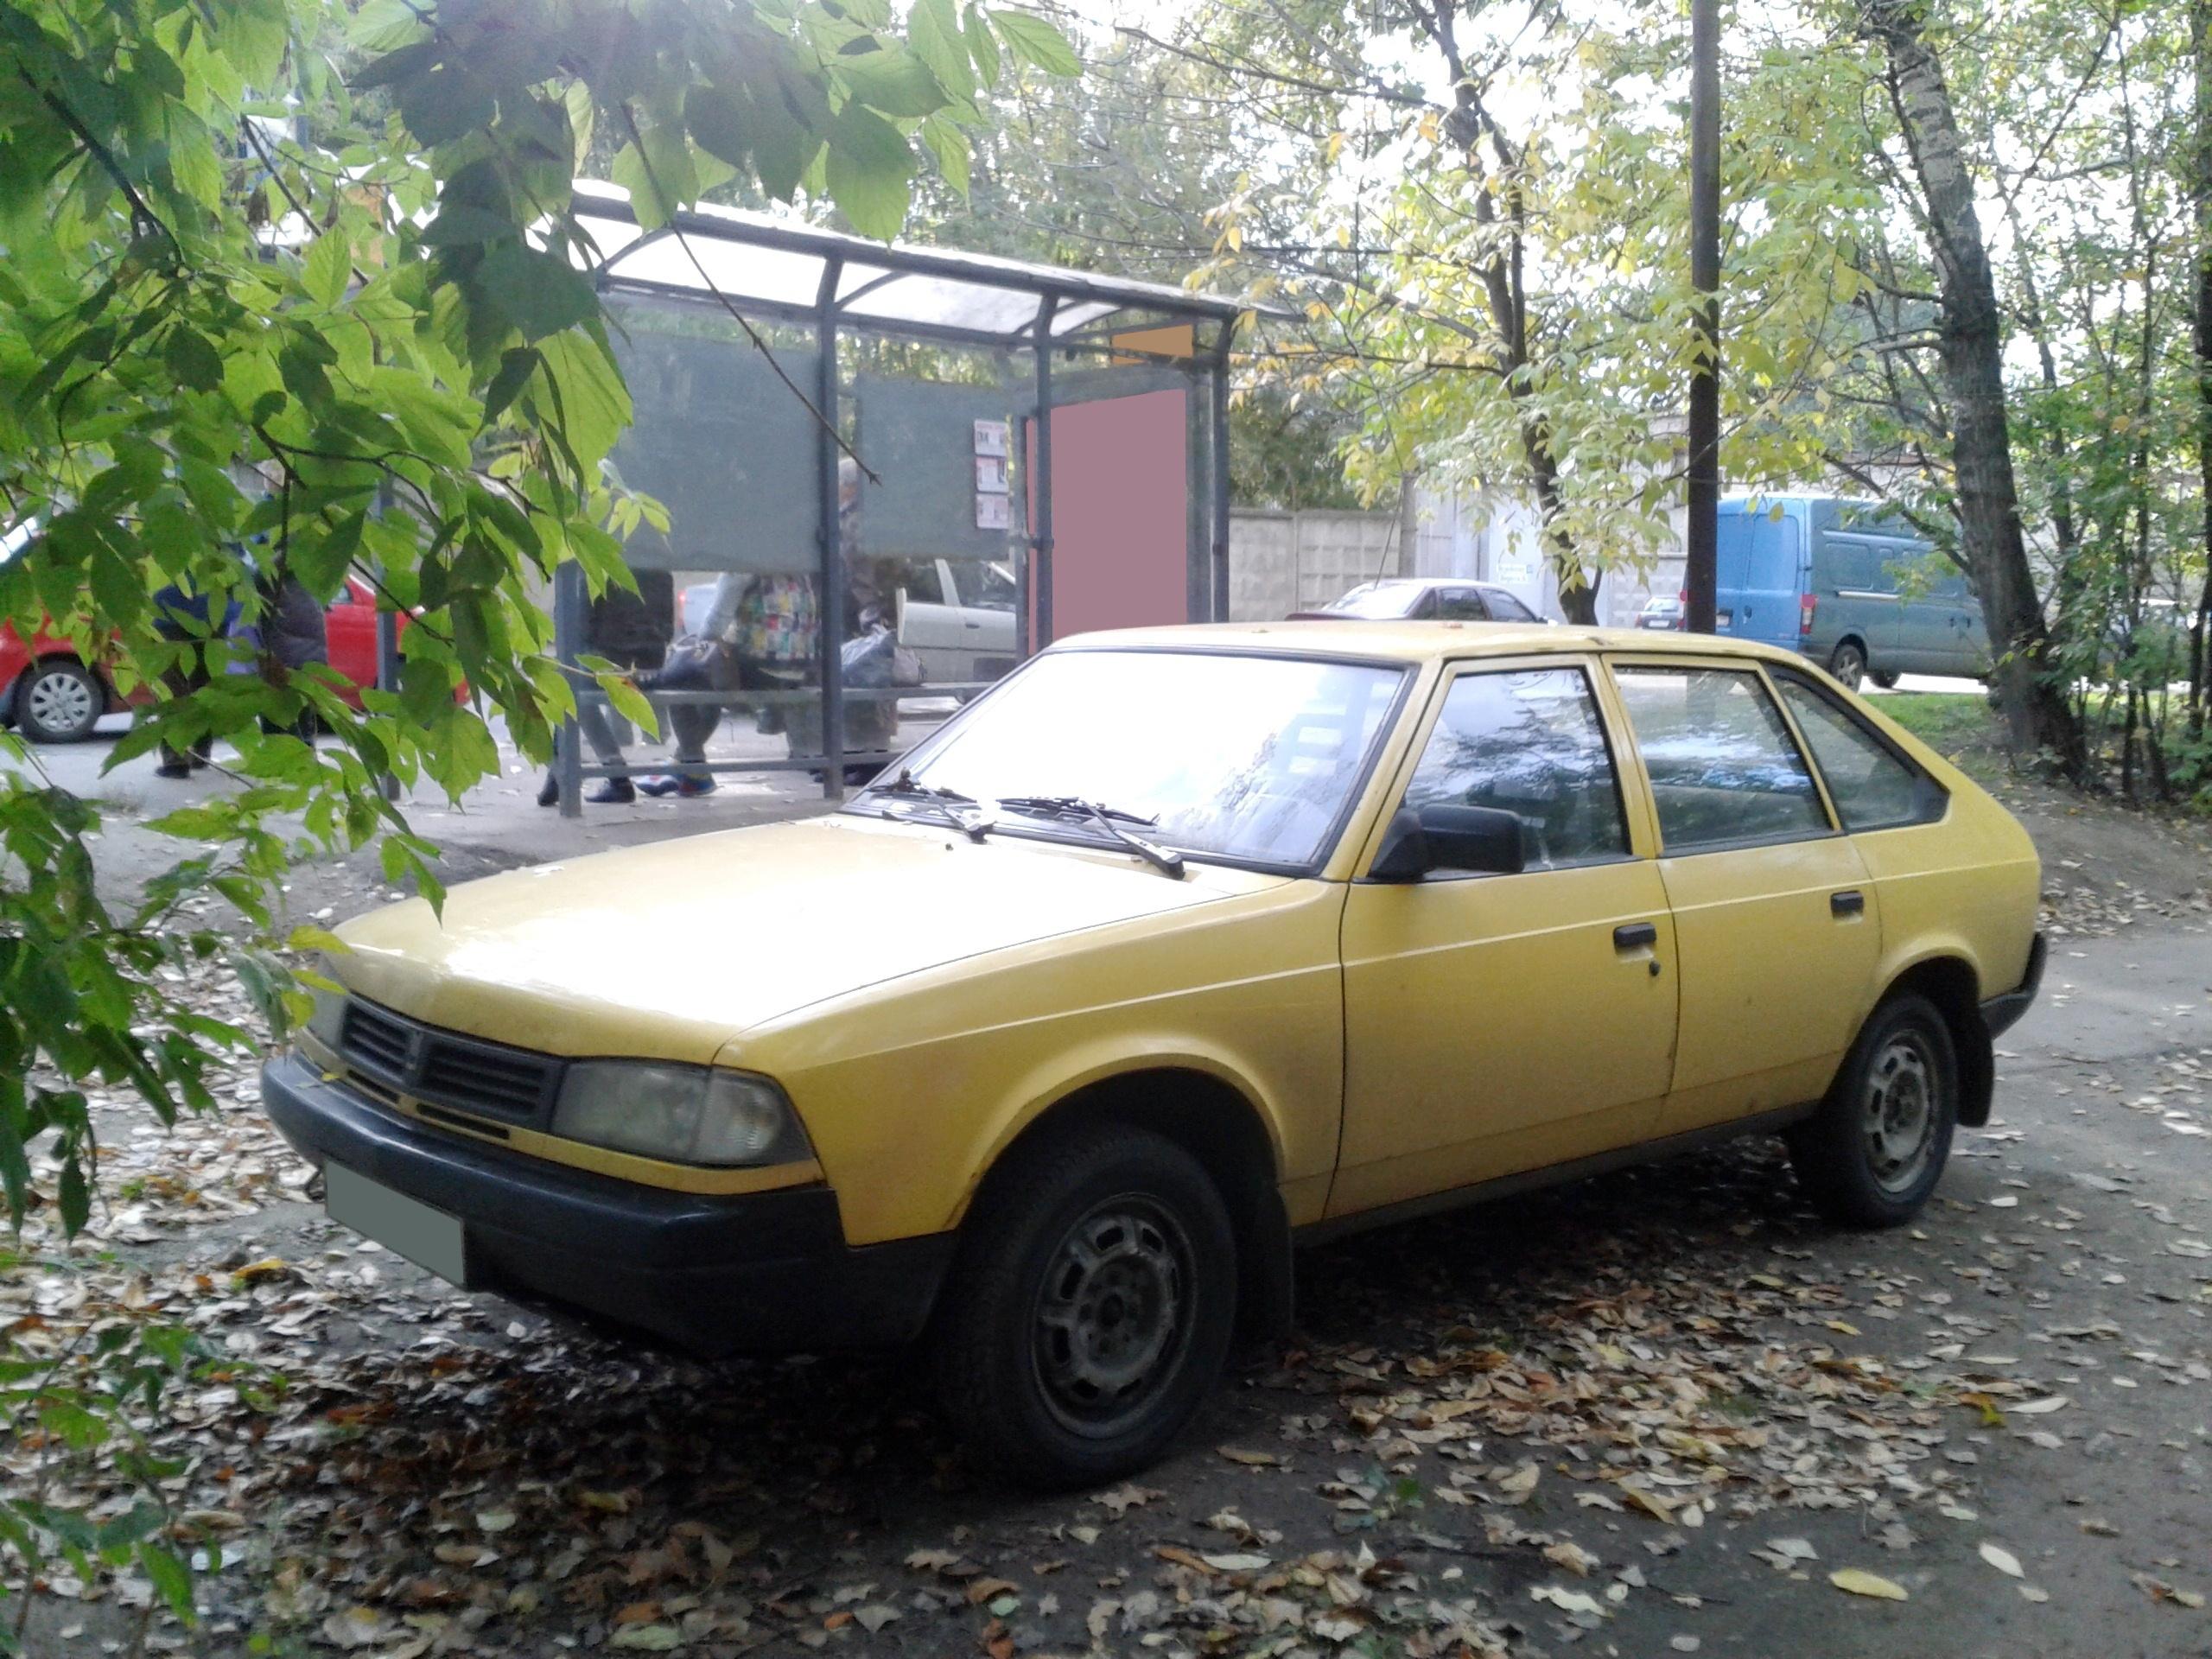 File:Moskvich 2141 Svjatogor (yellow).jpg